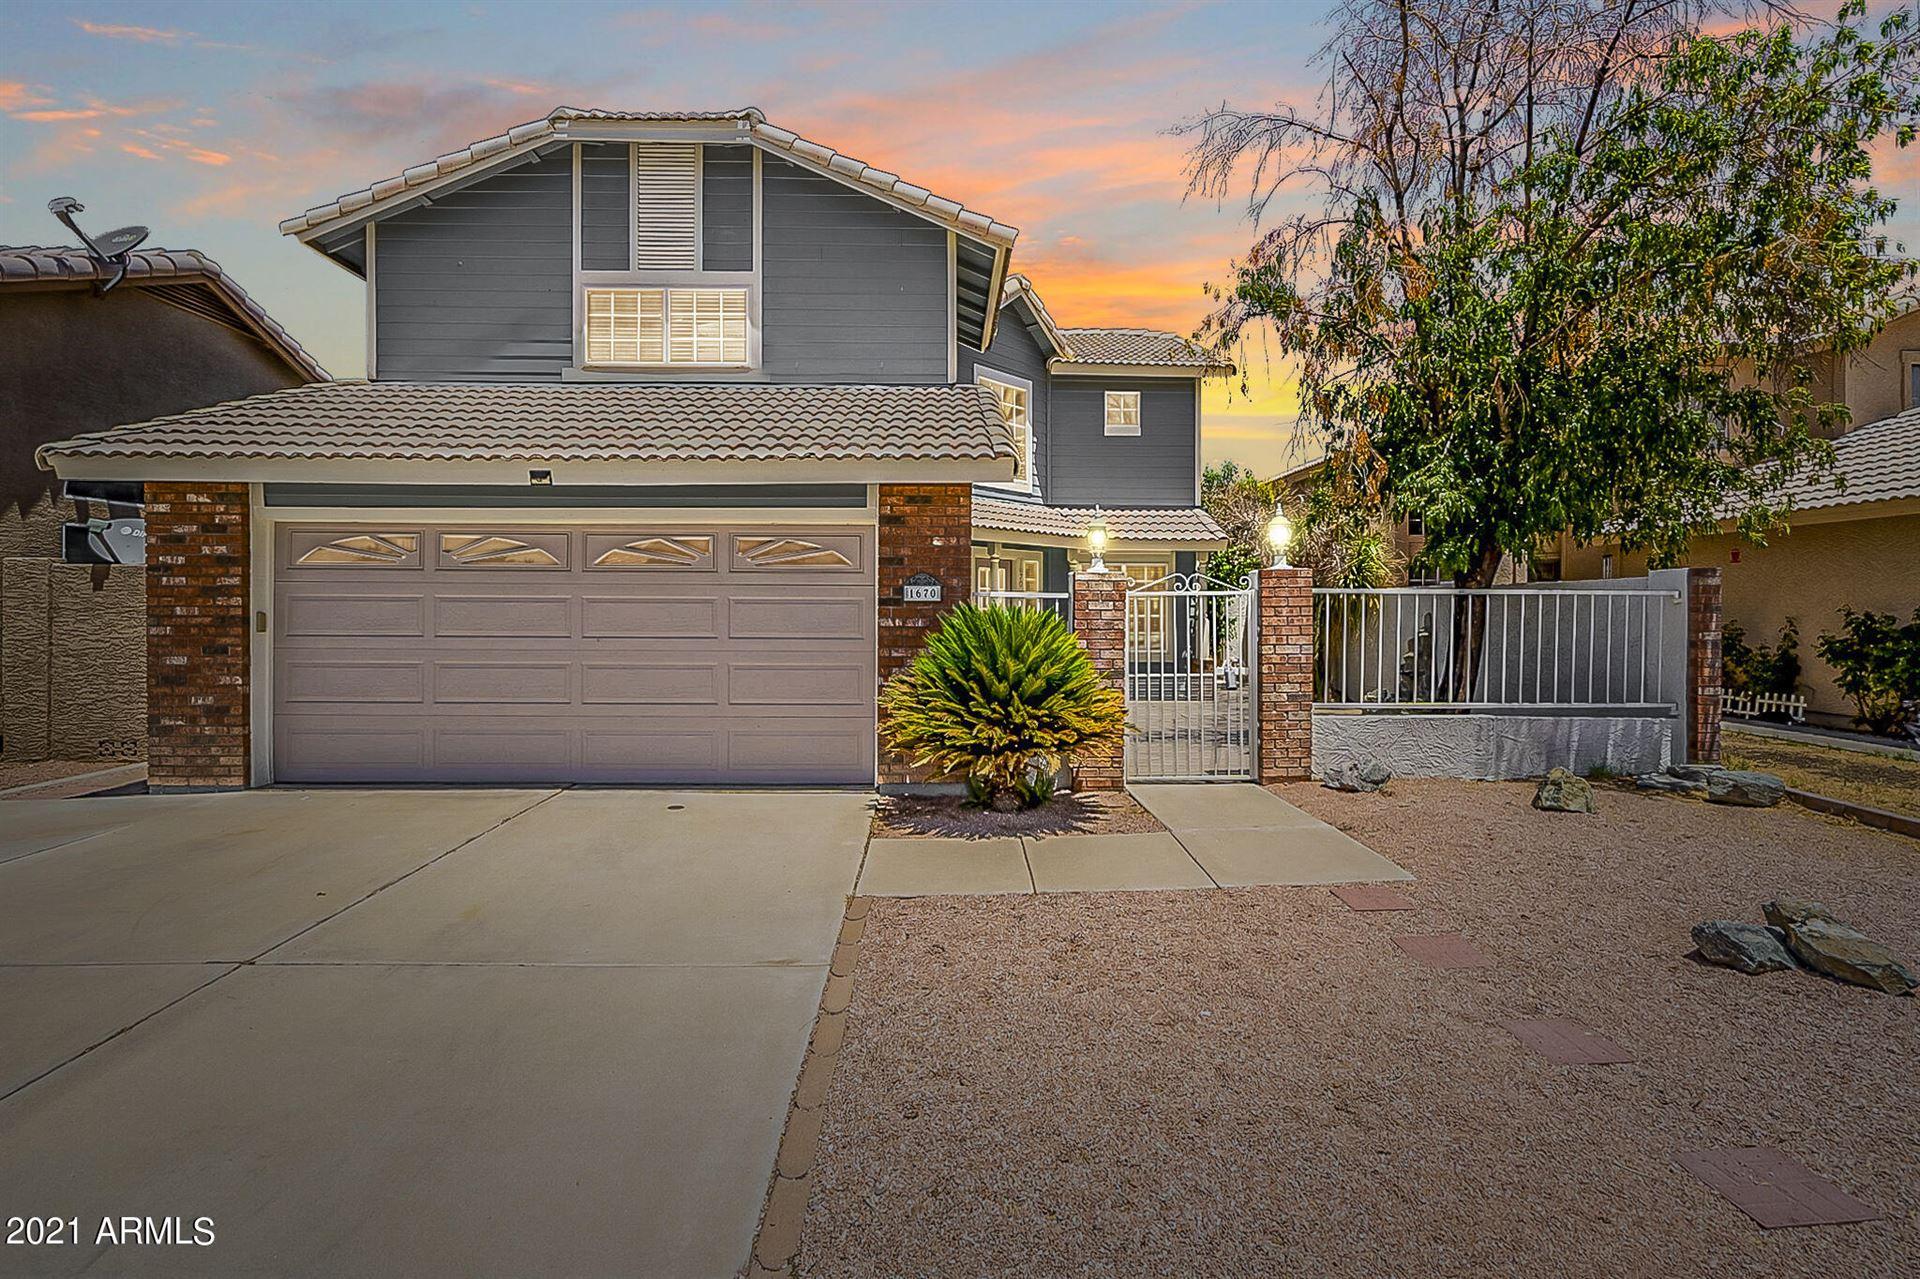 1670 E GARY Drive, Chandler, AZ 85225 - MLS#: 6266886